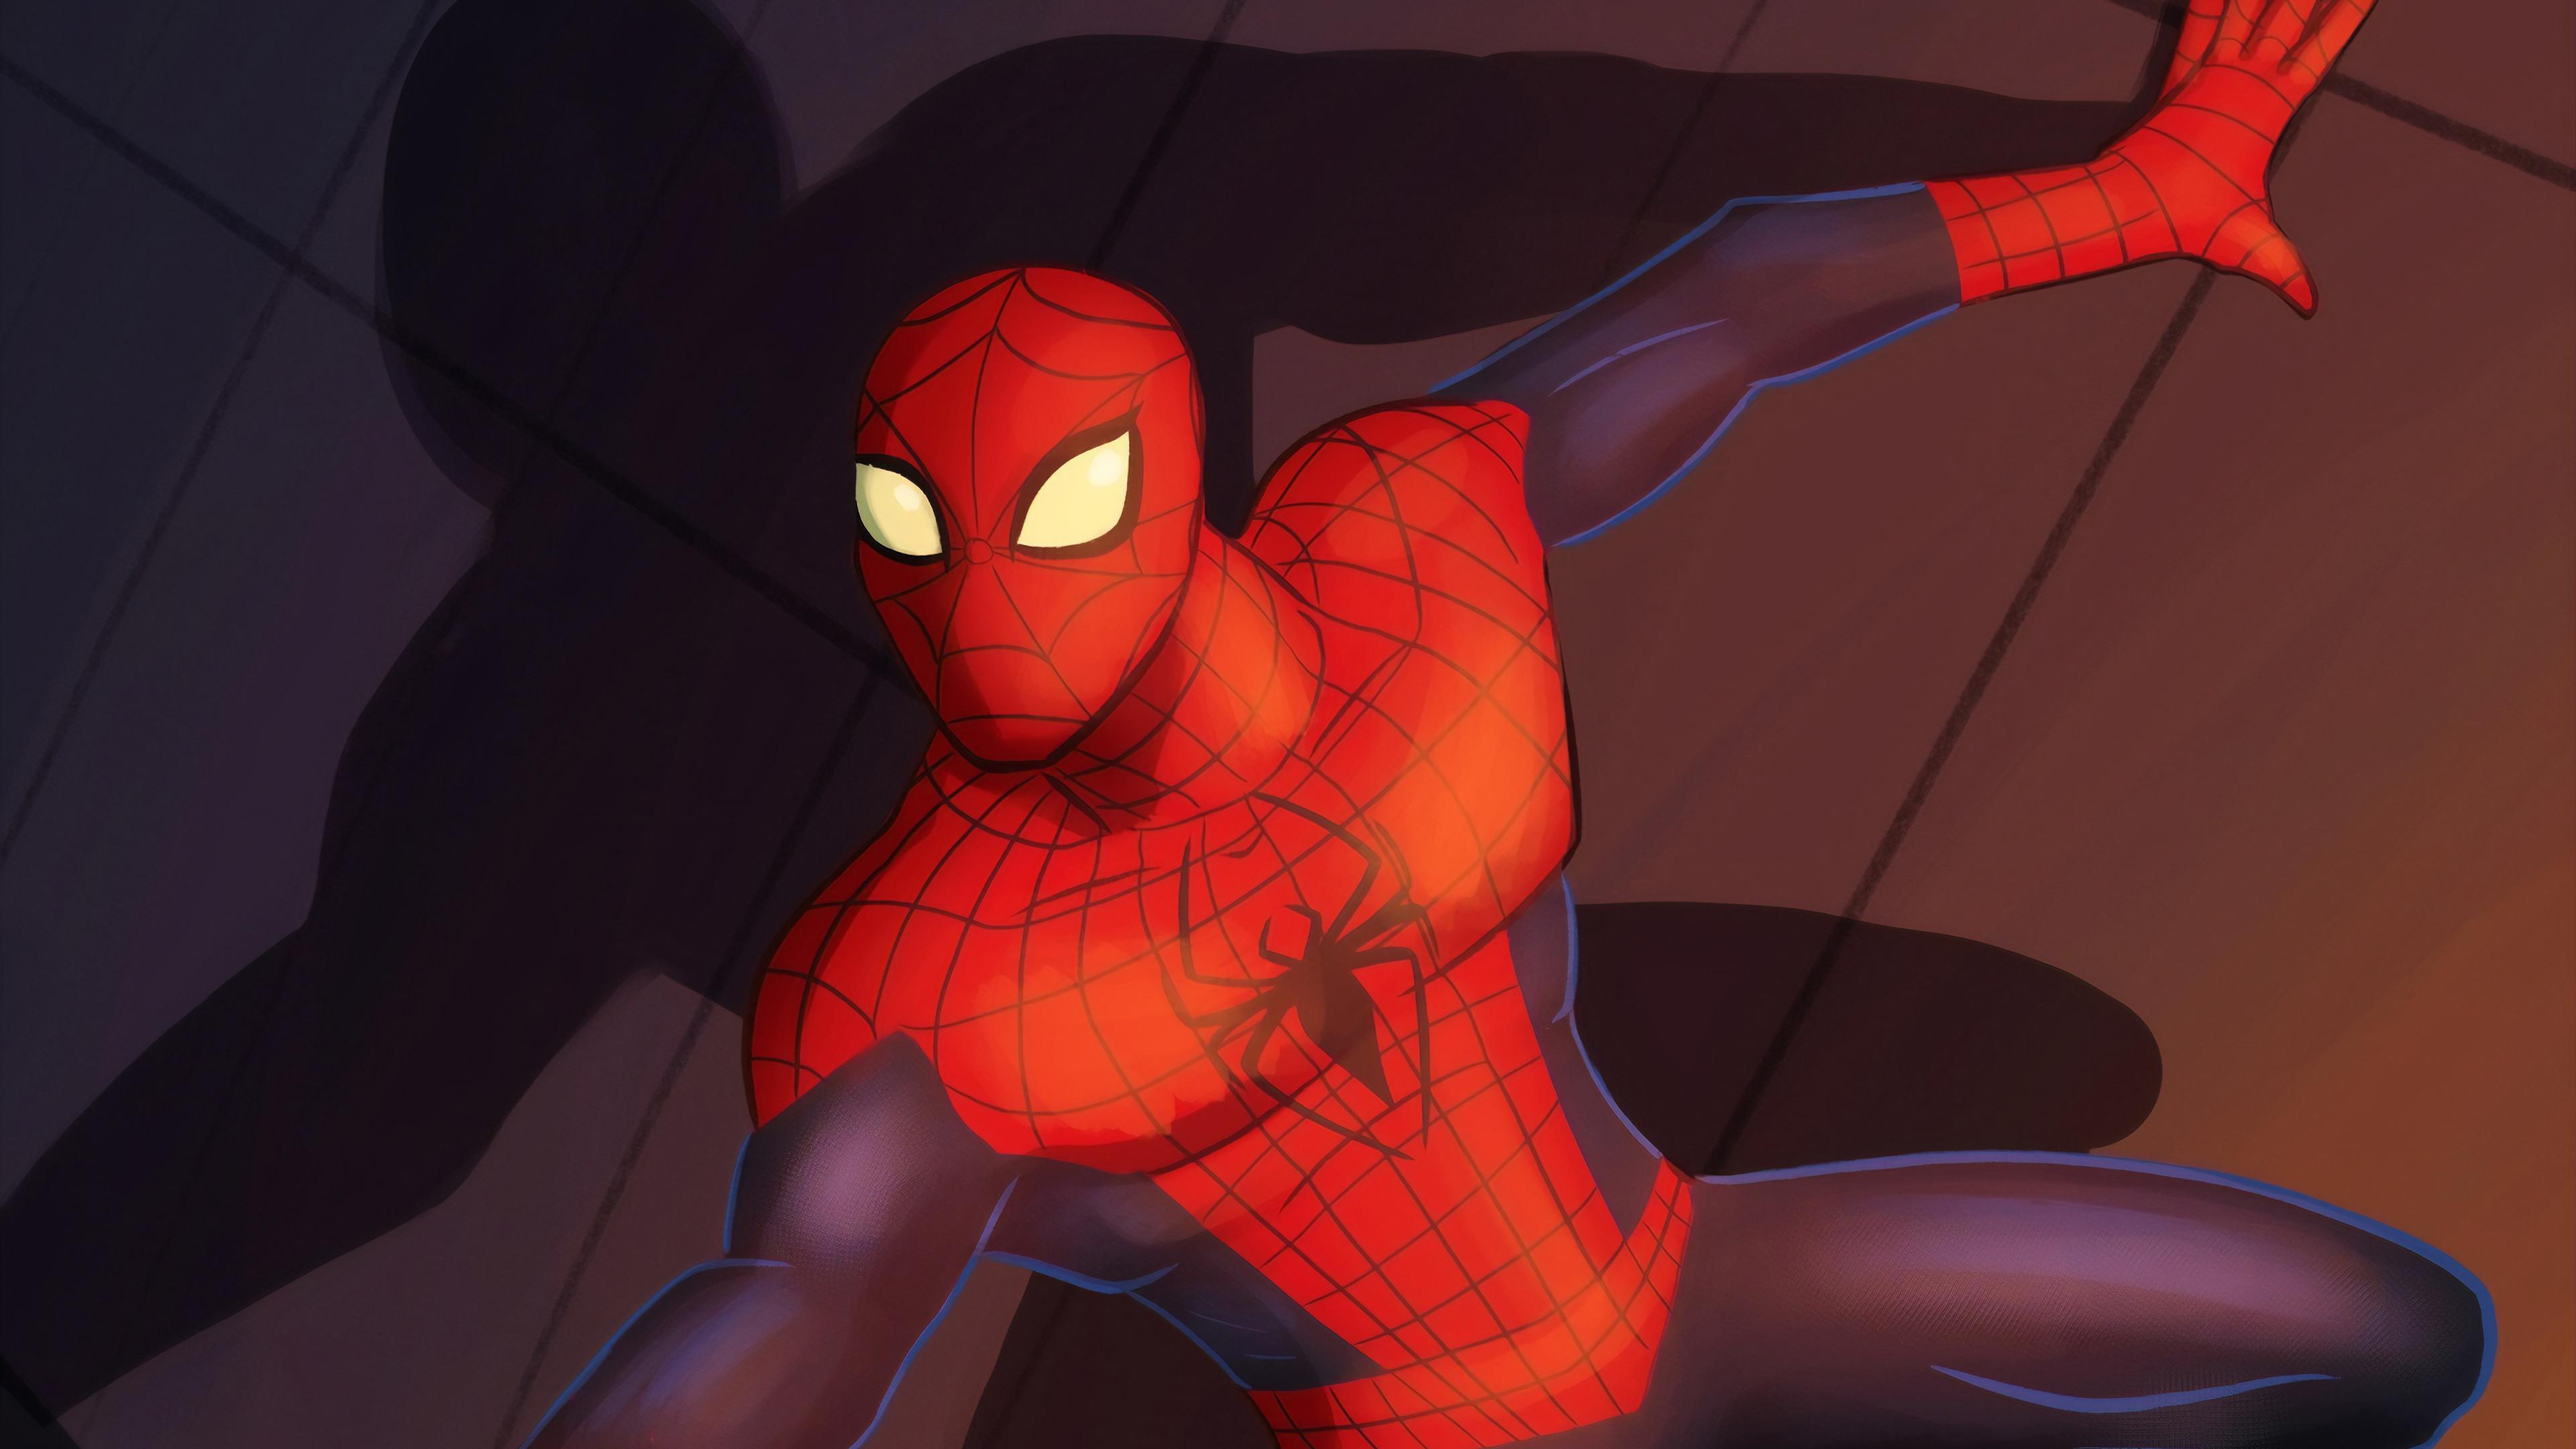 spider man digital art 1565053039 - Spider Man Digital Art - superheroes wallpapers, spiderman wallpapers, hd-wallpapers, digital art wallpapers, artwork wallpapers, artstation wallpapers, artist wallpapers, 4k-wallpapers